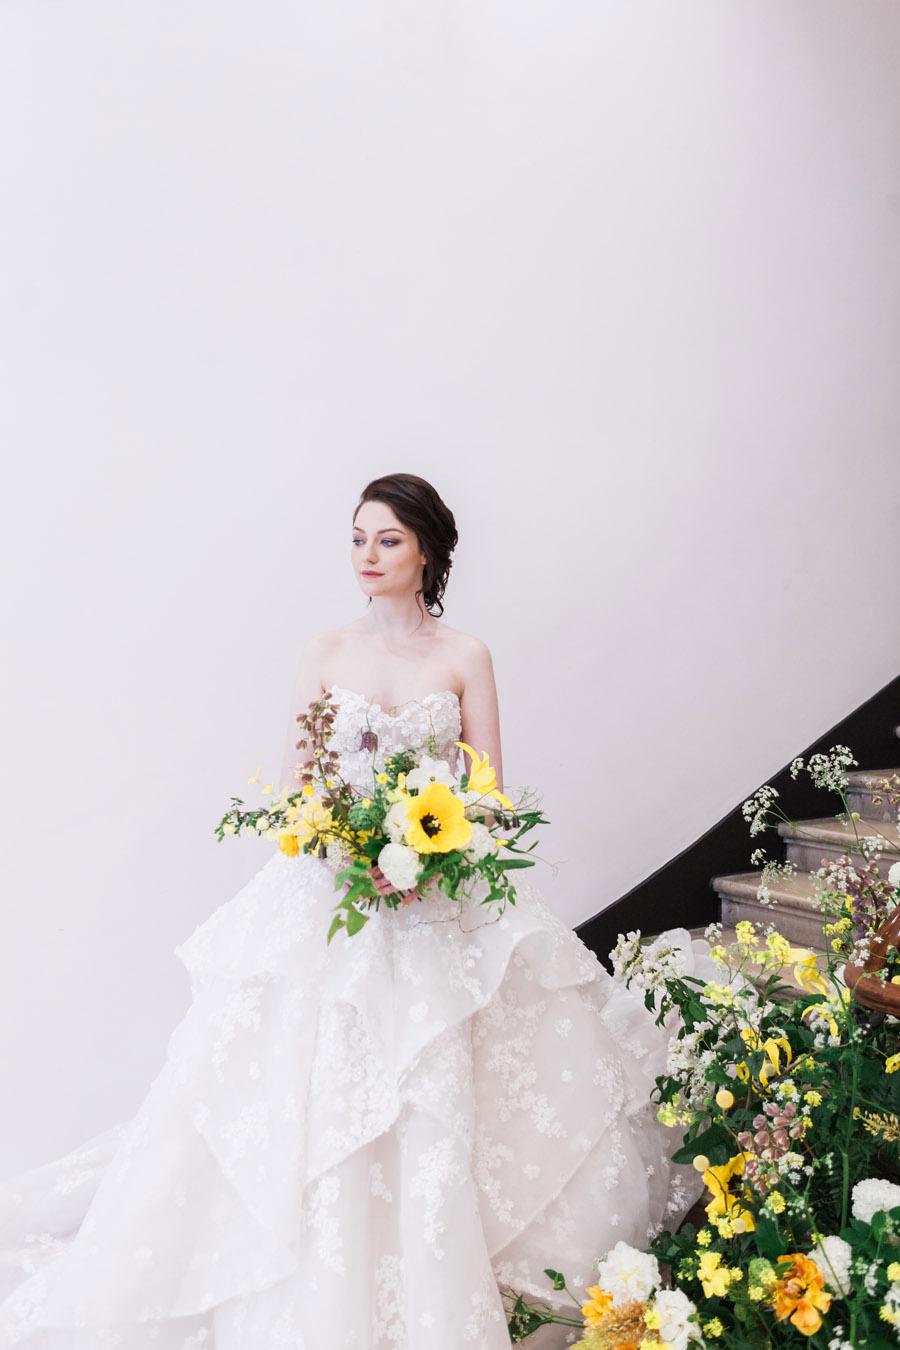 Glorious yellow Bloomologie blooms and styling by Chenai - photo credit Amanda Karen Photography (2)